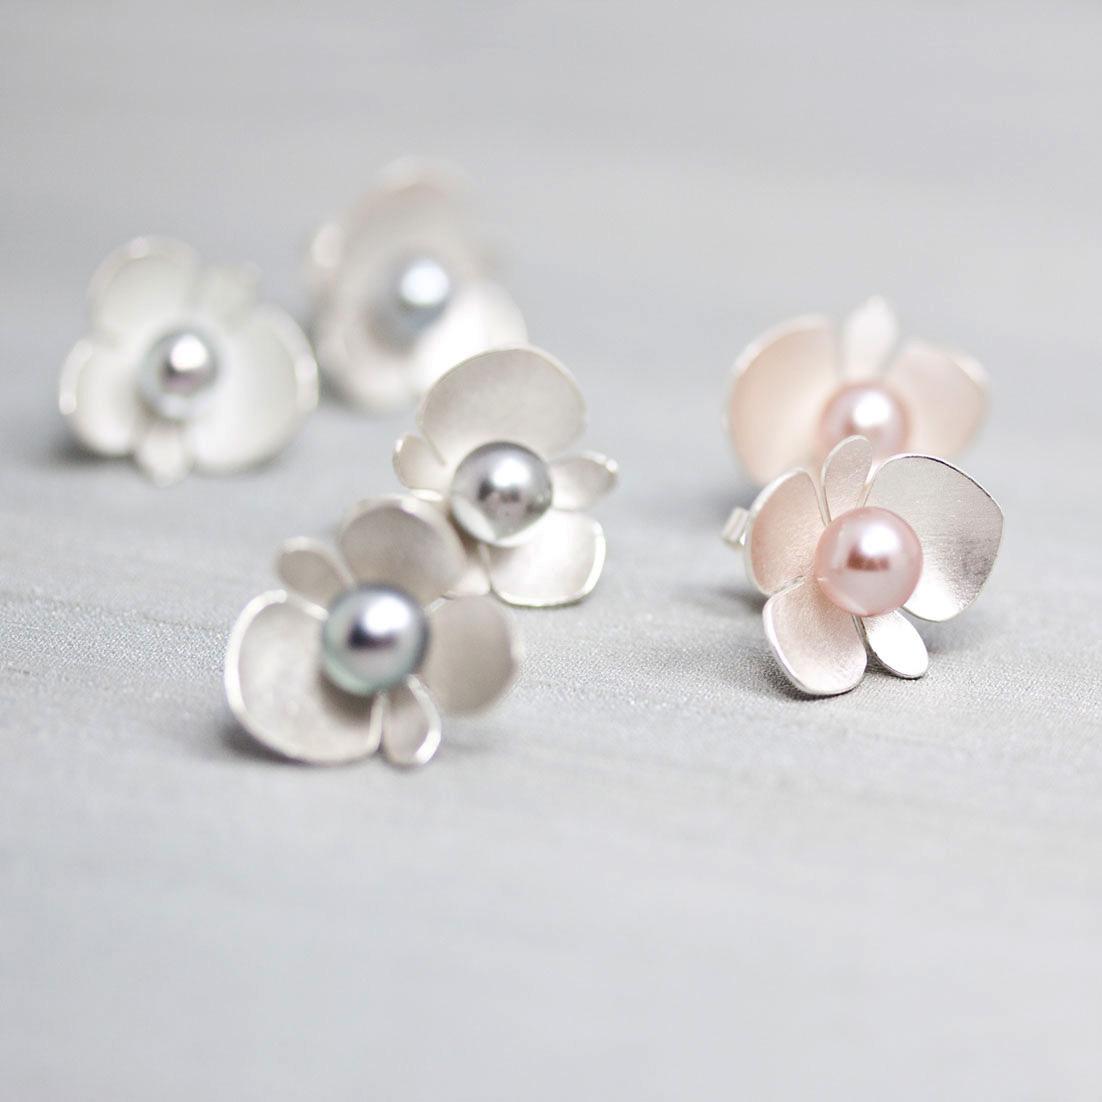 Nutida_Svenskt_Silver_begonia_silver Petronella_Eriksson _unika_smycken_freshwater_pearls _earrings